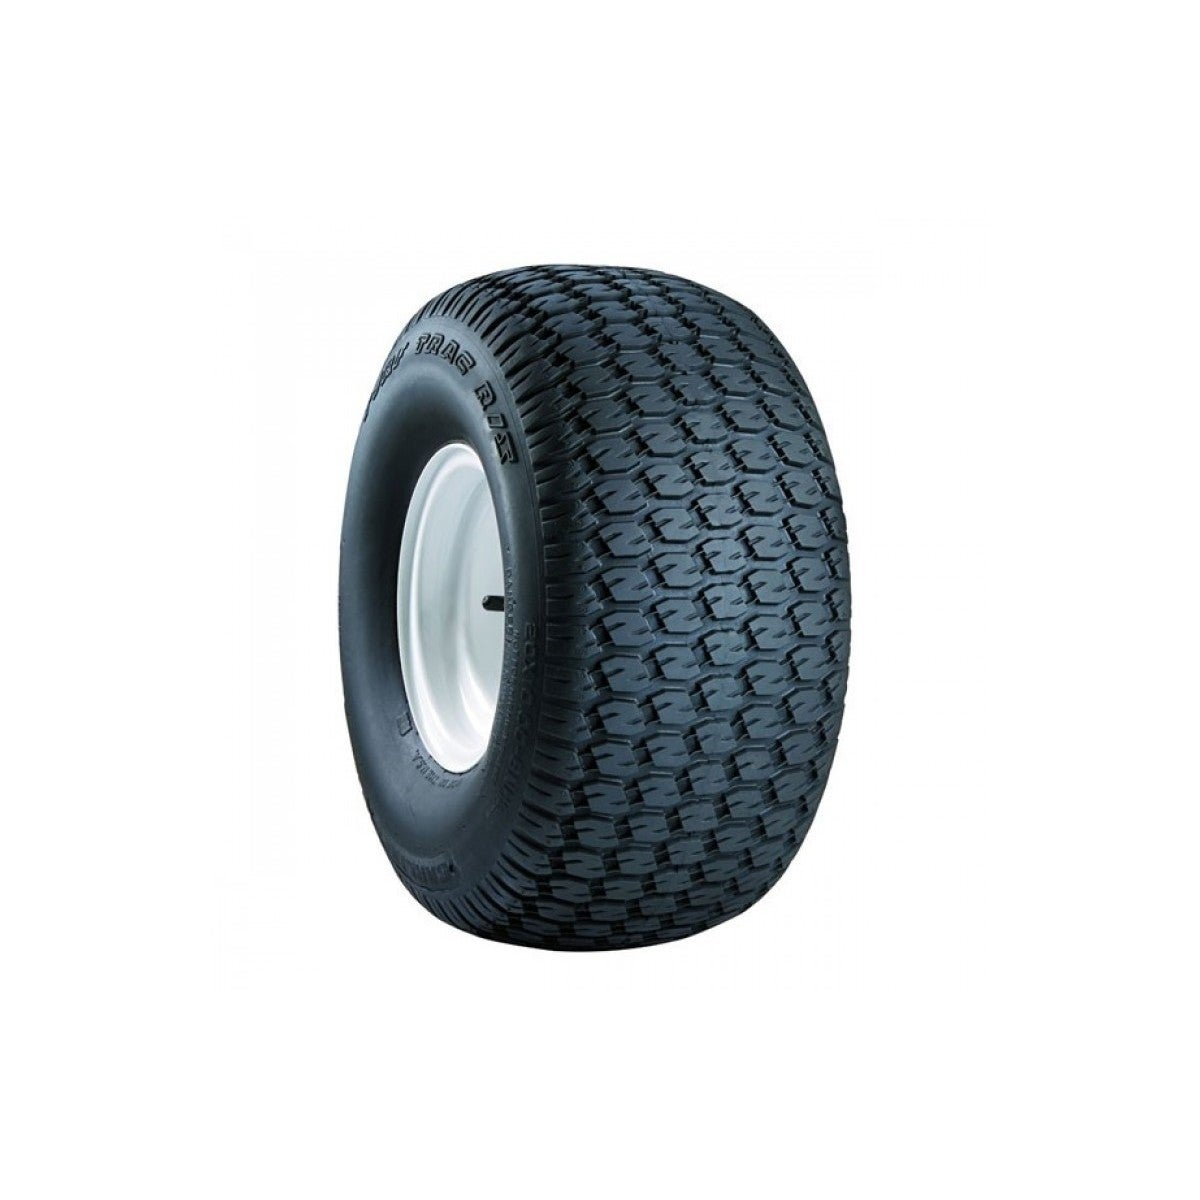 Carlisle Turf Trac RS Lawn & Garden Tire - 11X400-5 LRA/2...